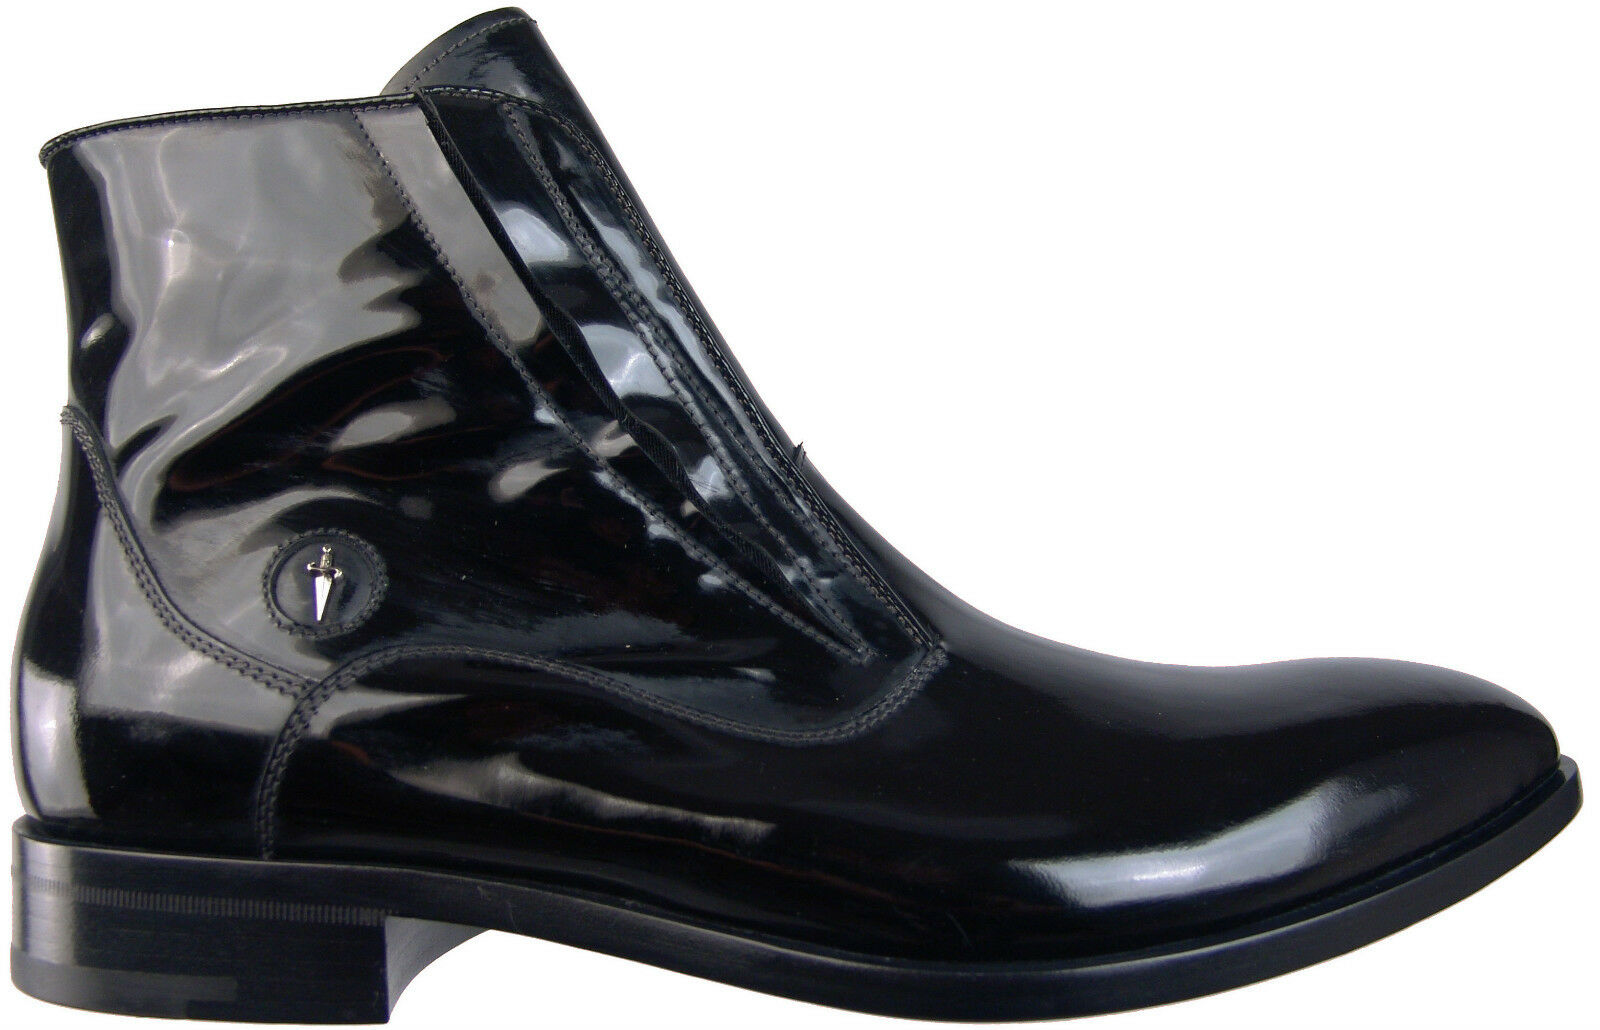 New Authentic  975 Cesare Paciotti US 6 Ankle Boots Italian Designer Shoes